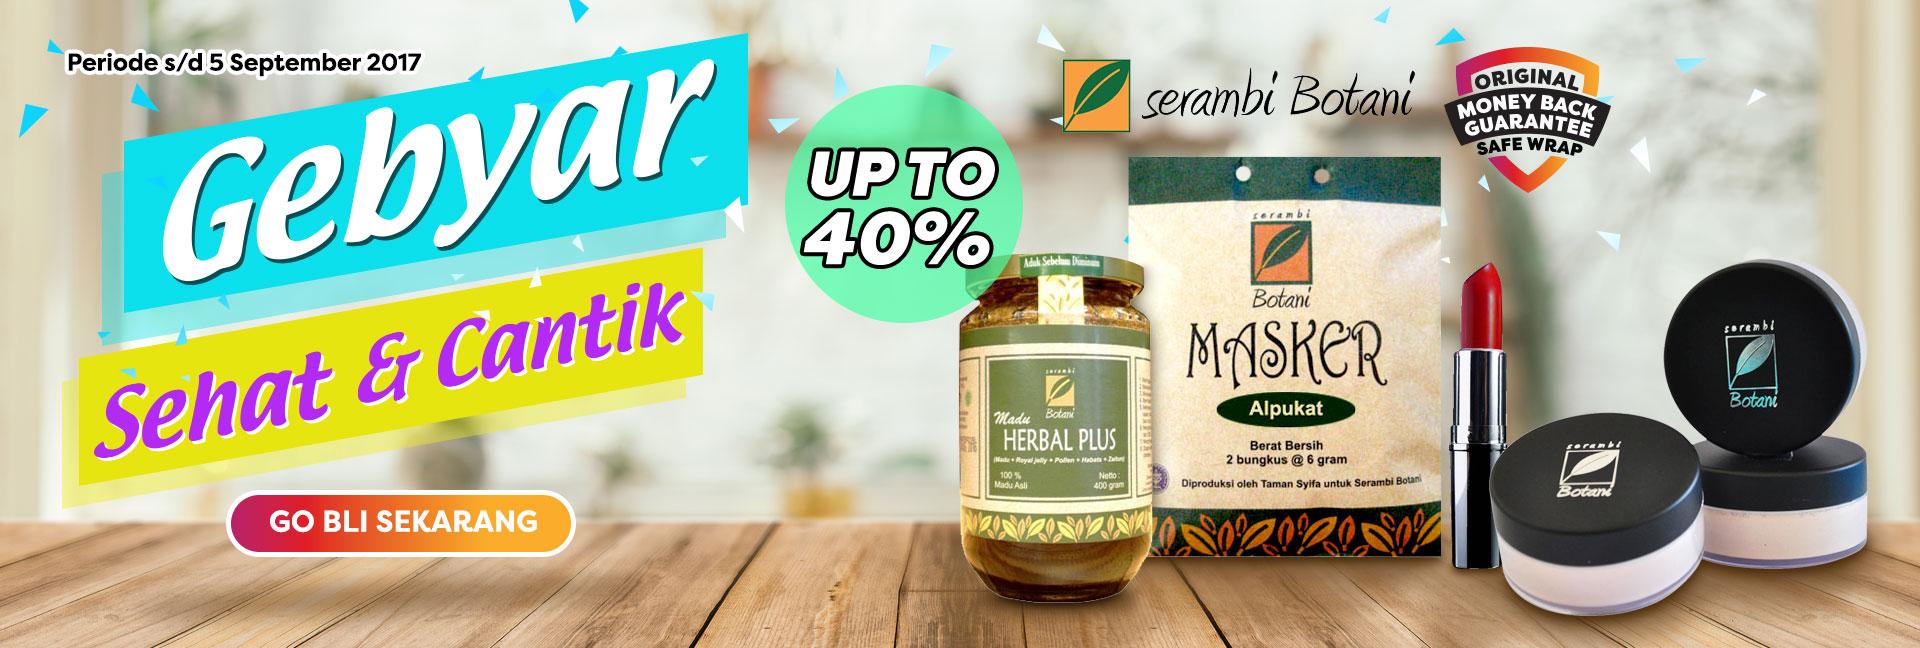 Serambi Botani Madu Herbal Plus 400 Daftar Harga Terbaru Indonesia Source · Madu Herbal Plus 200g